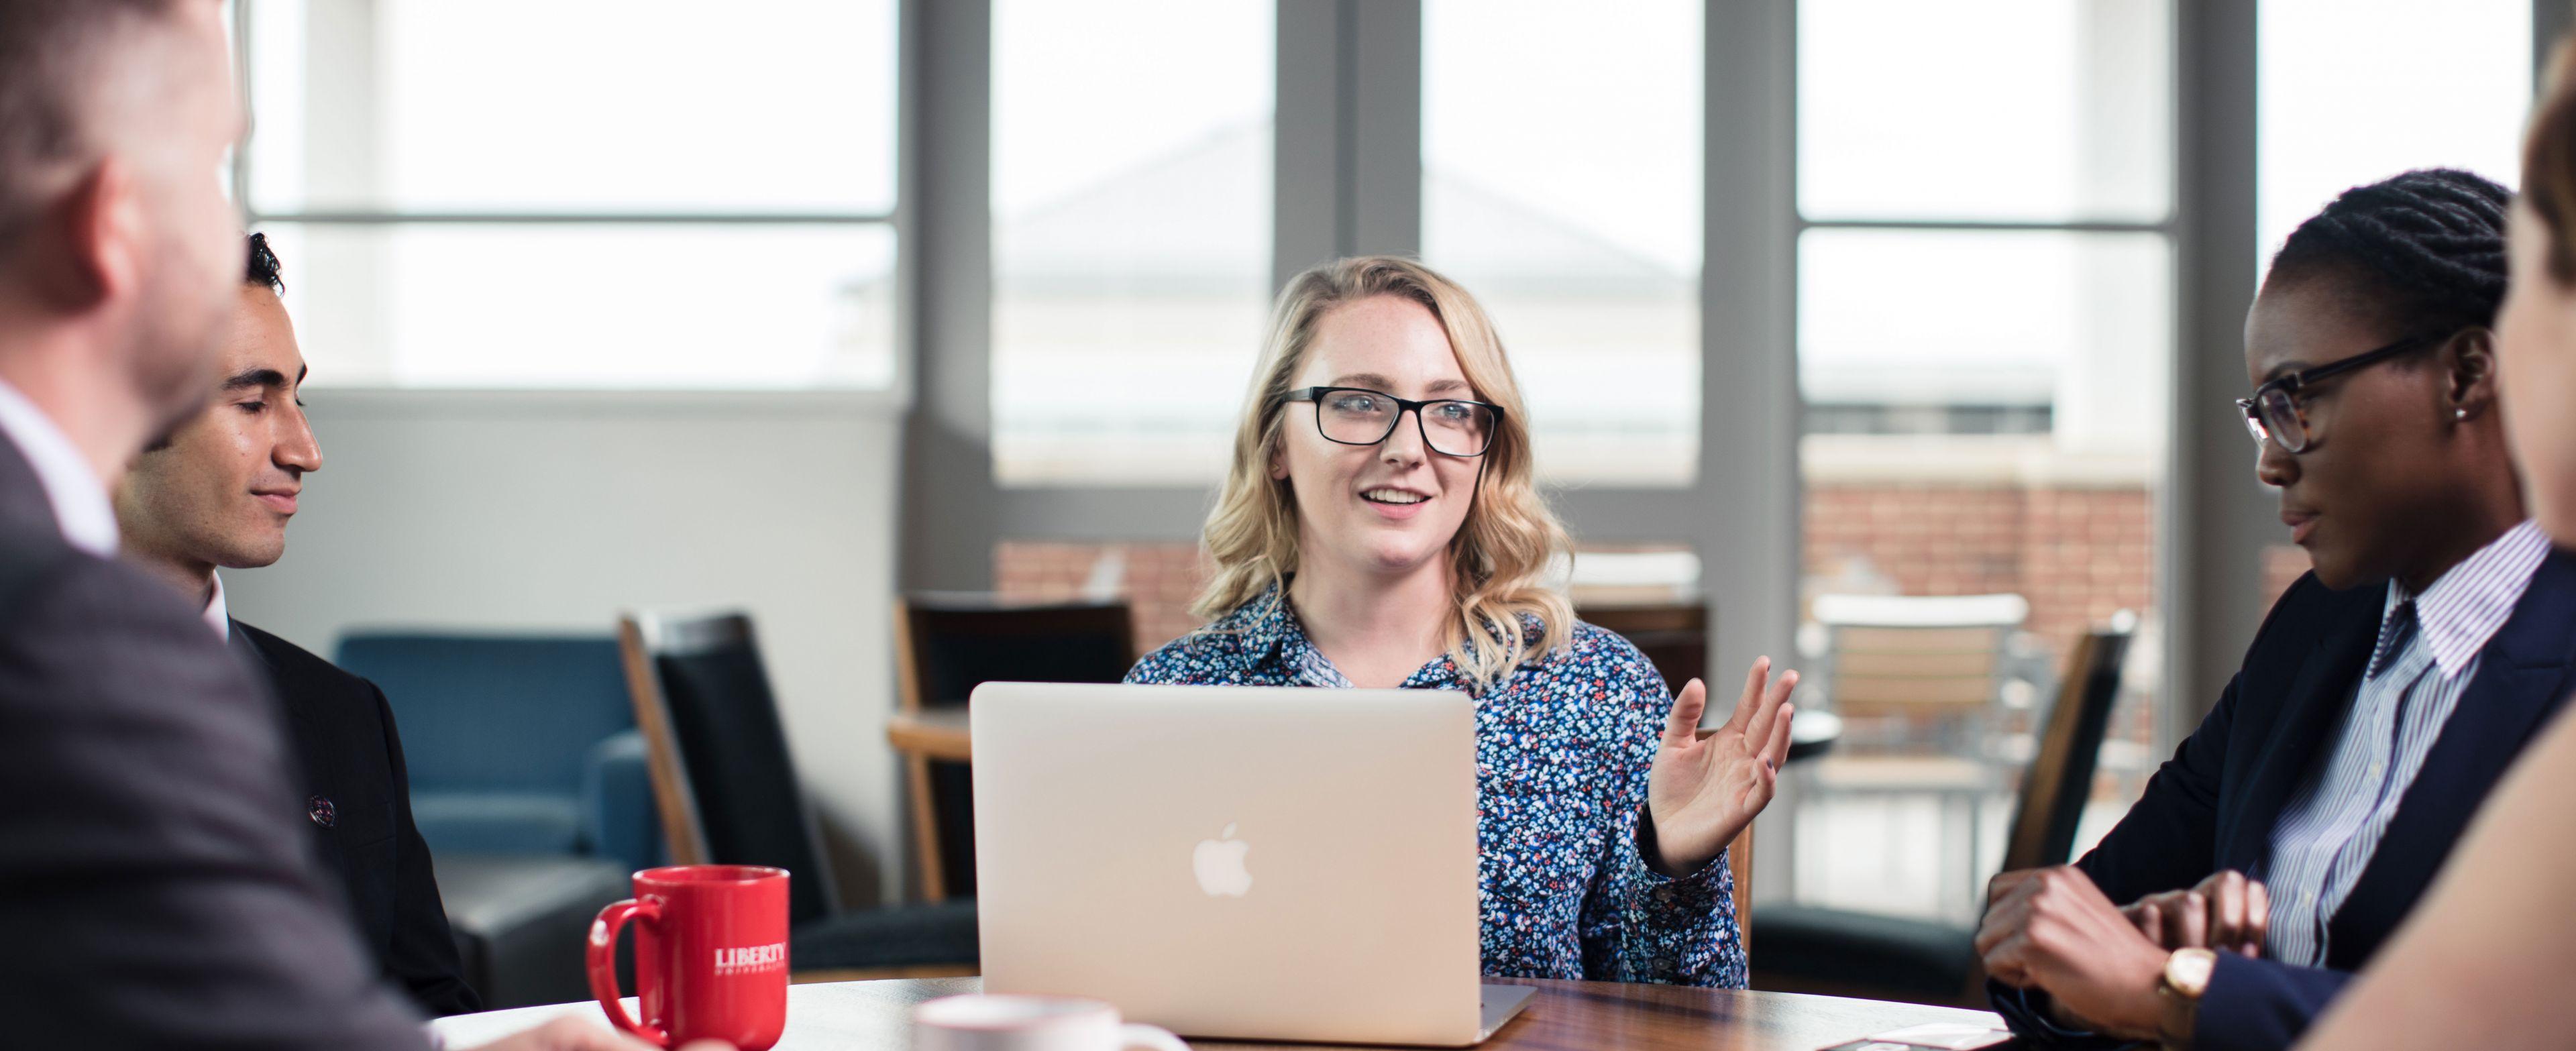 Bachelor's Degree in Strategic Communications